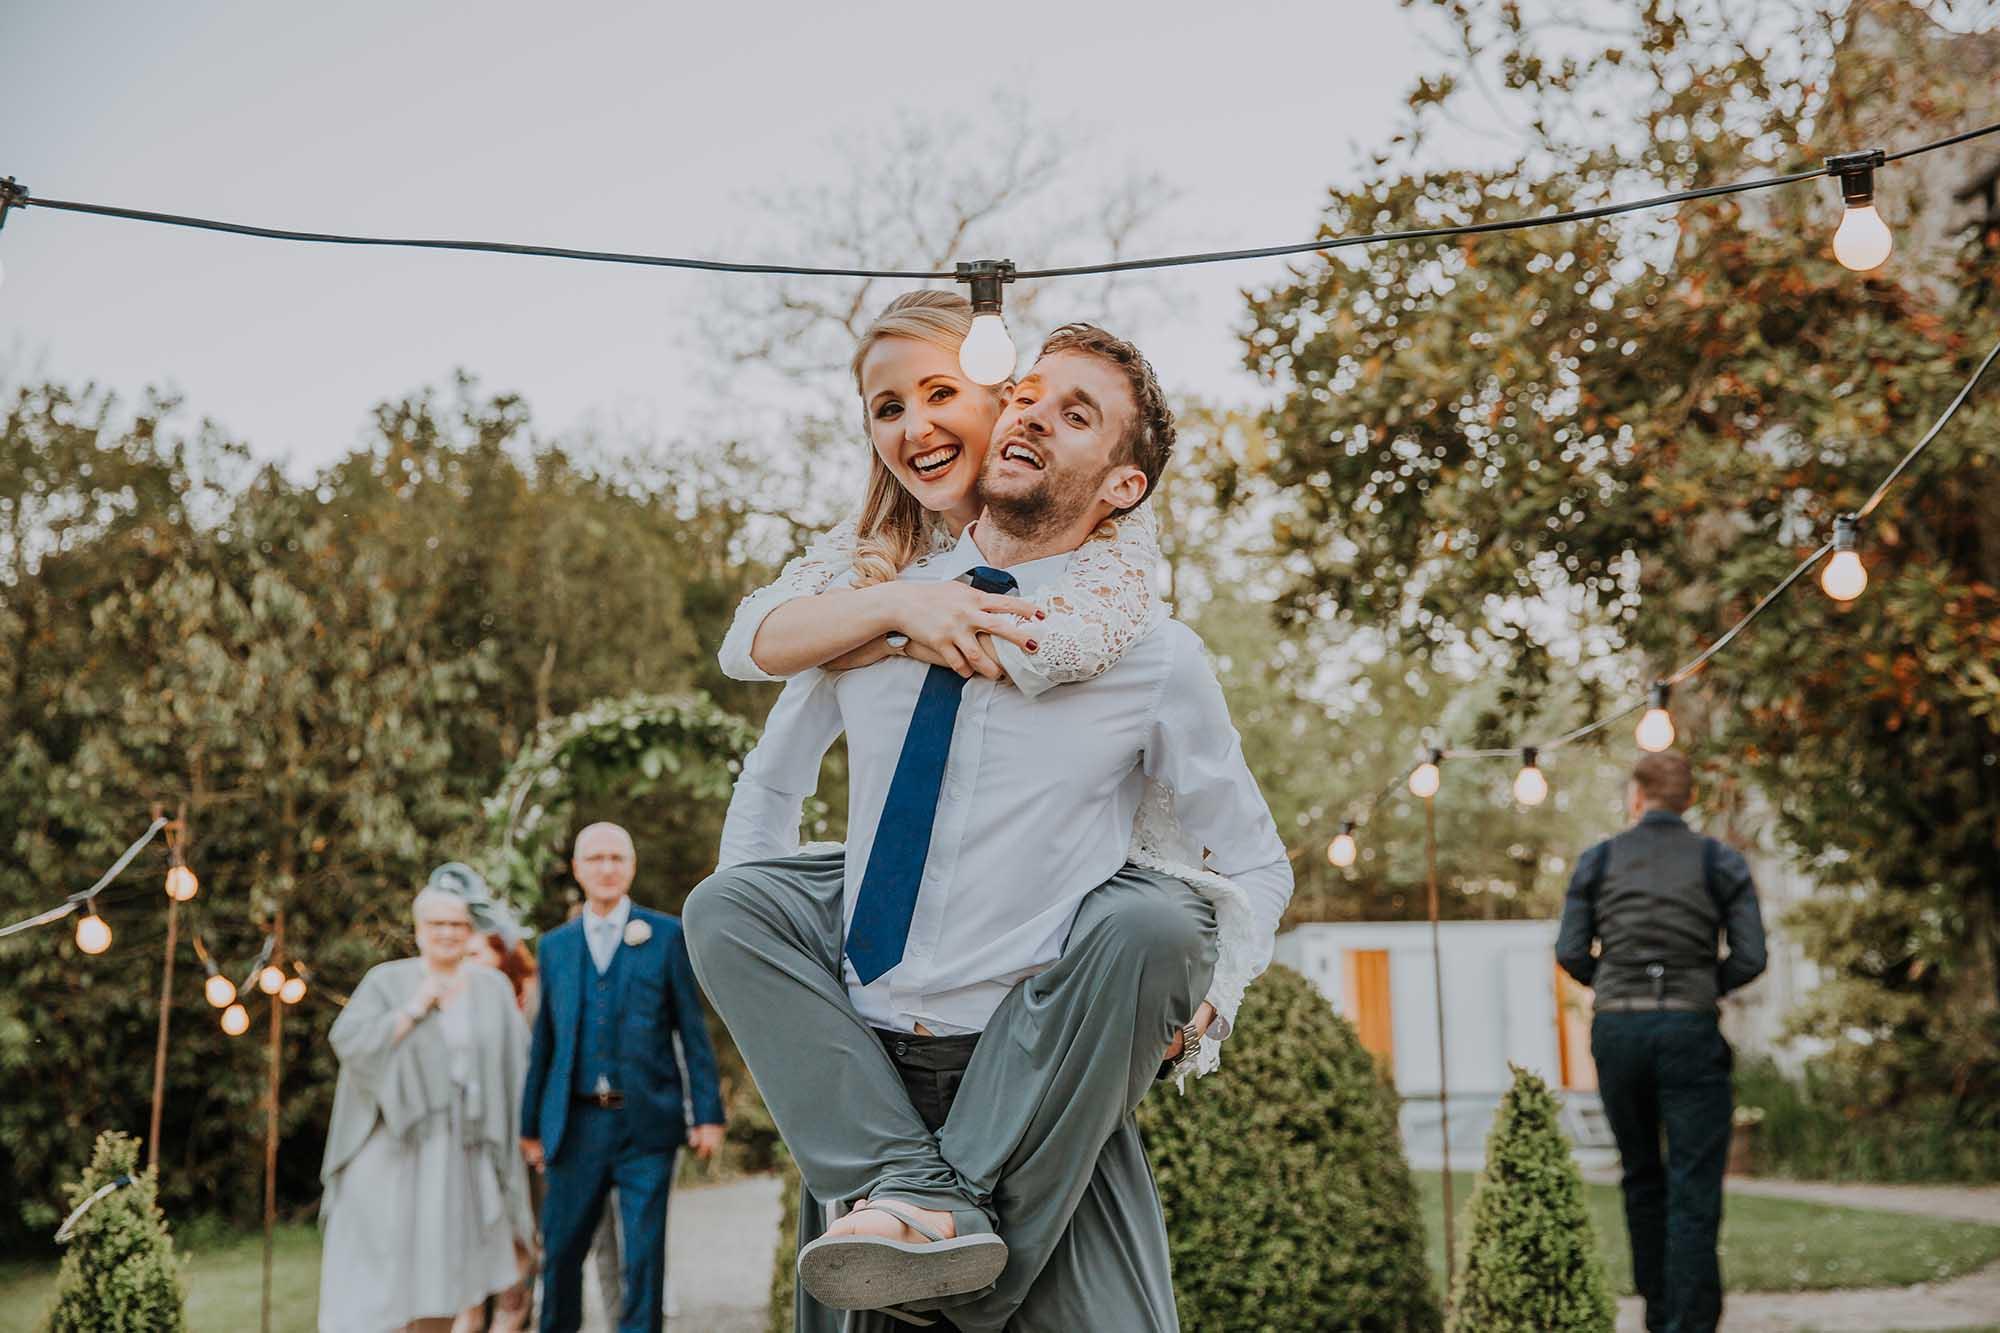 creative wedding photography tros yr afon anglesey